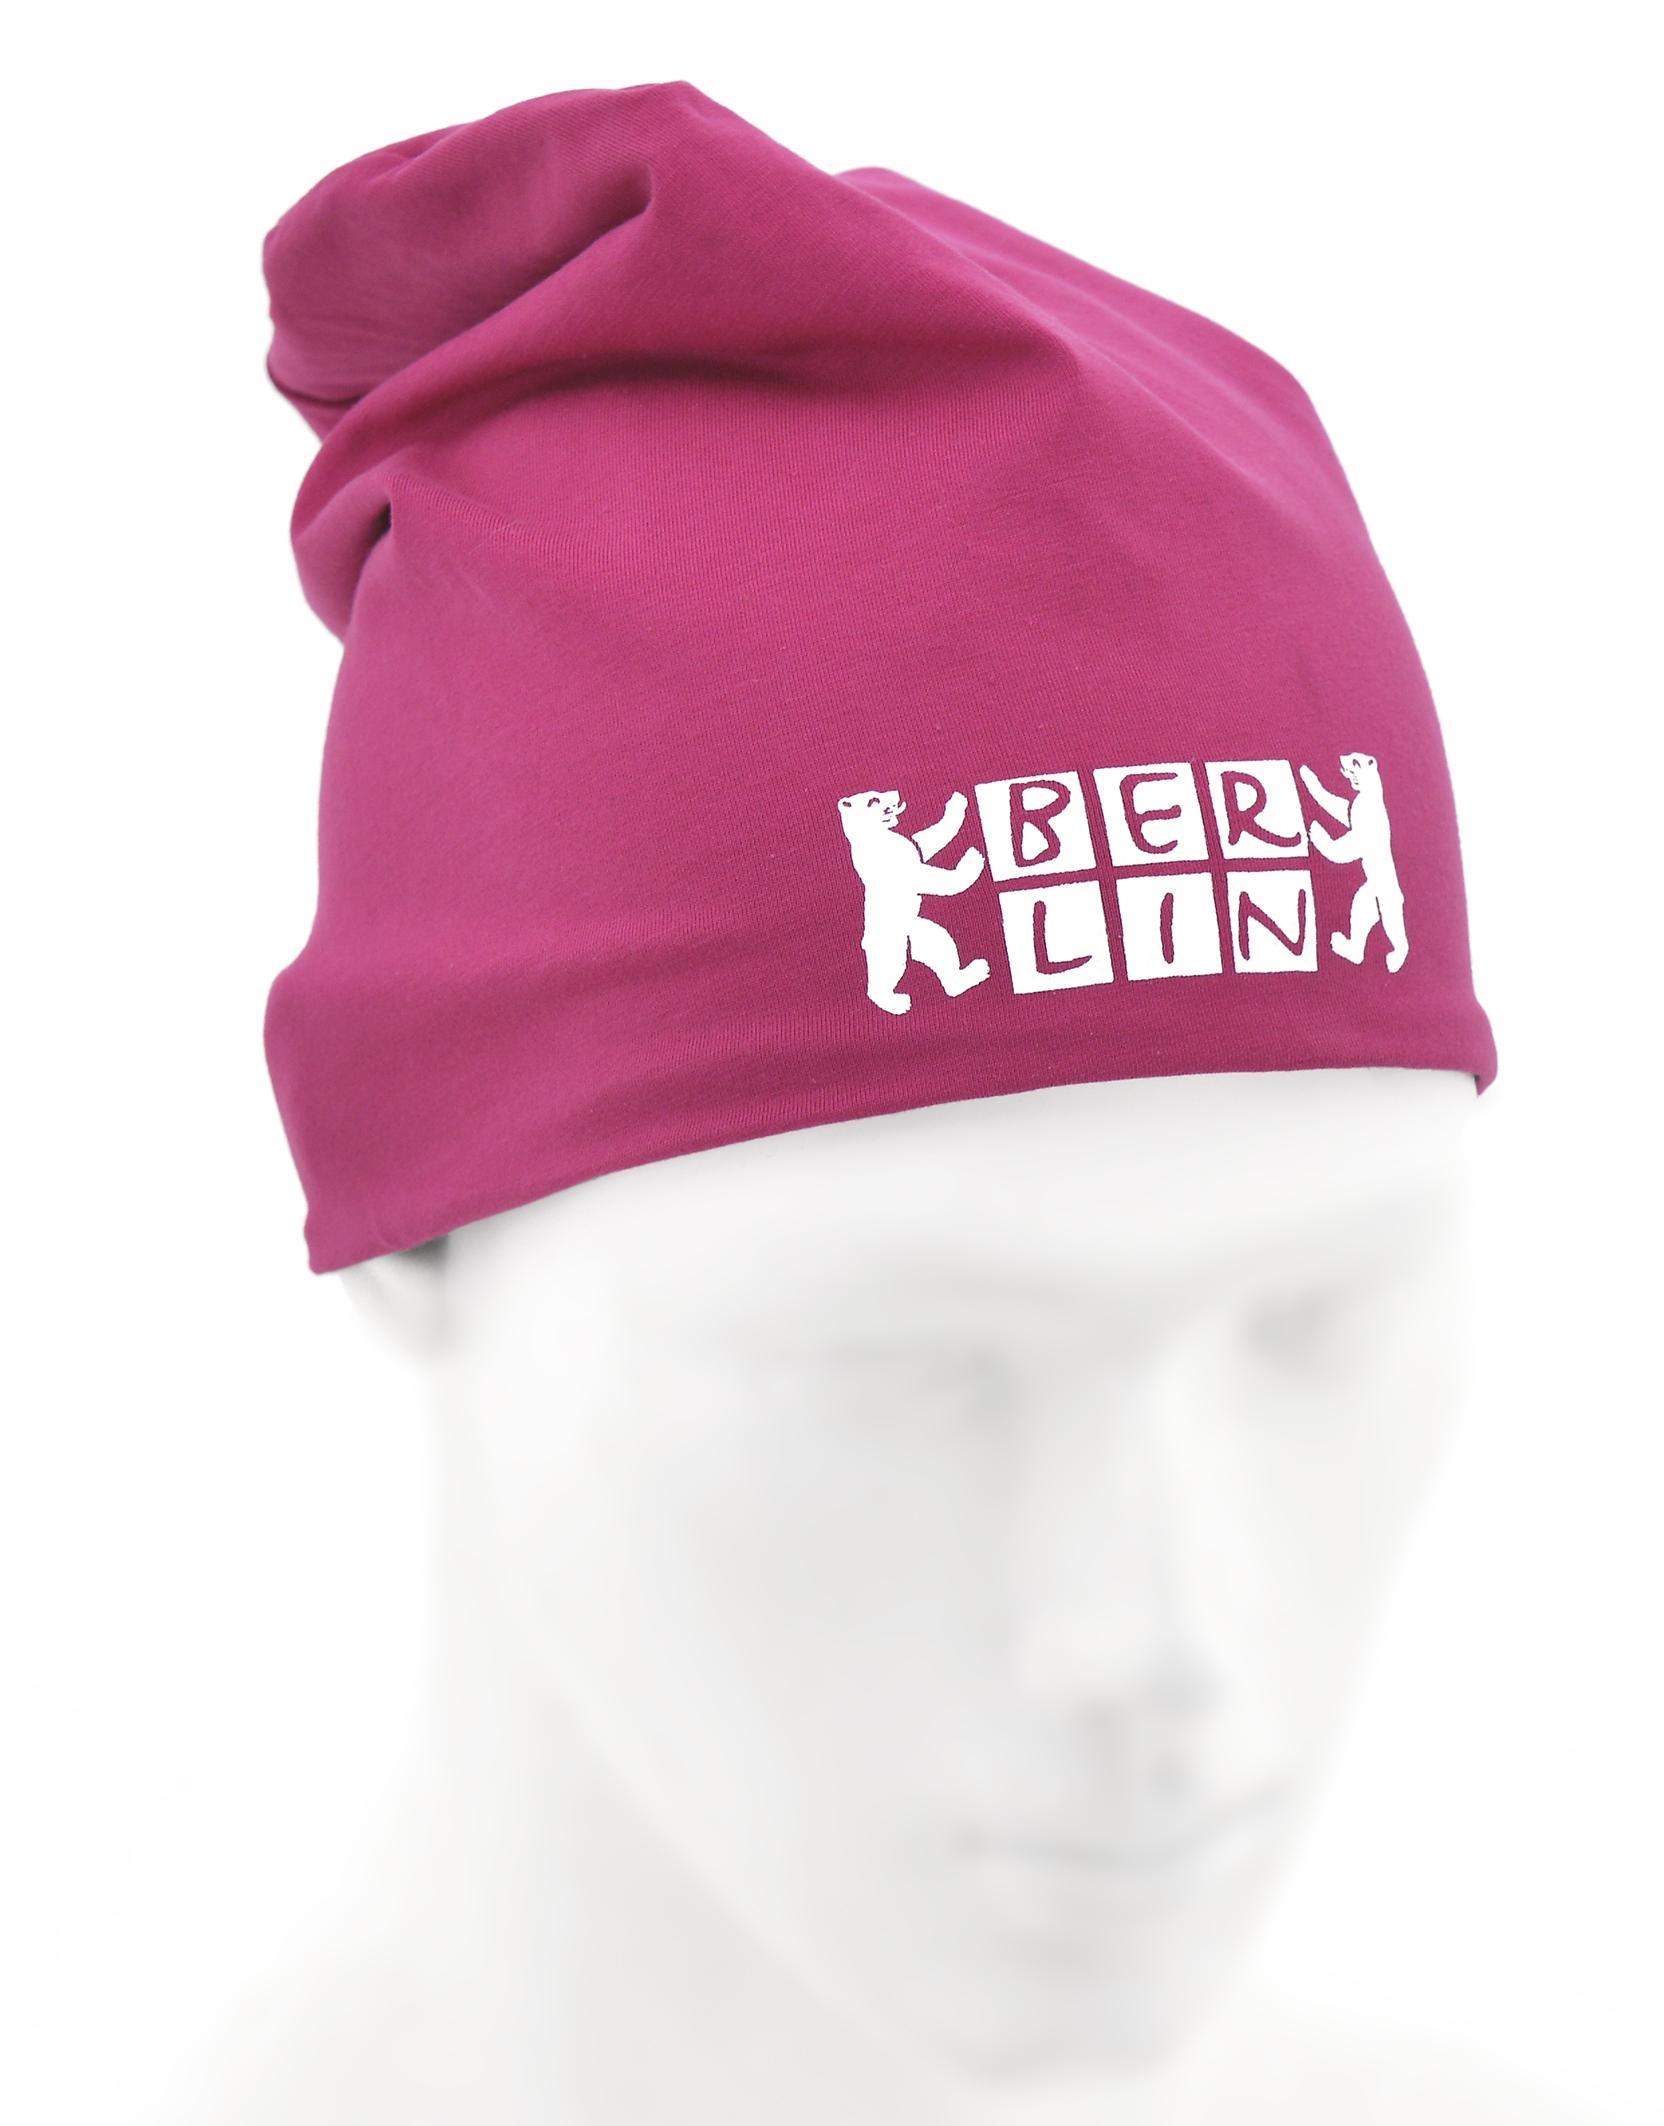 Wendemütze BERLIN Bär  grau/pink